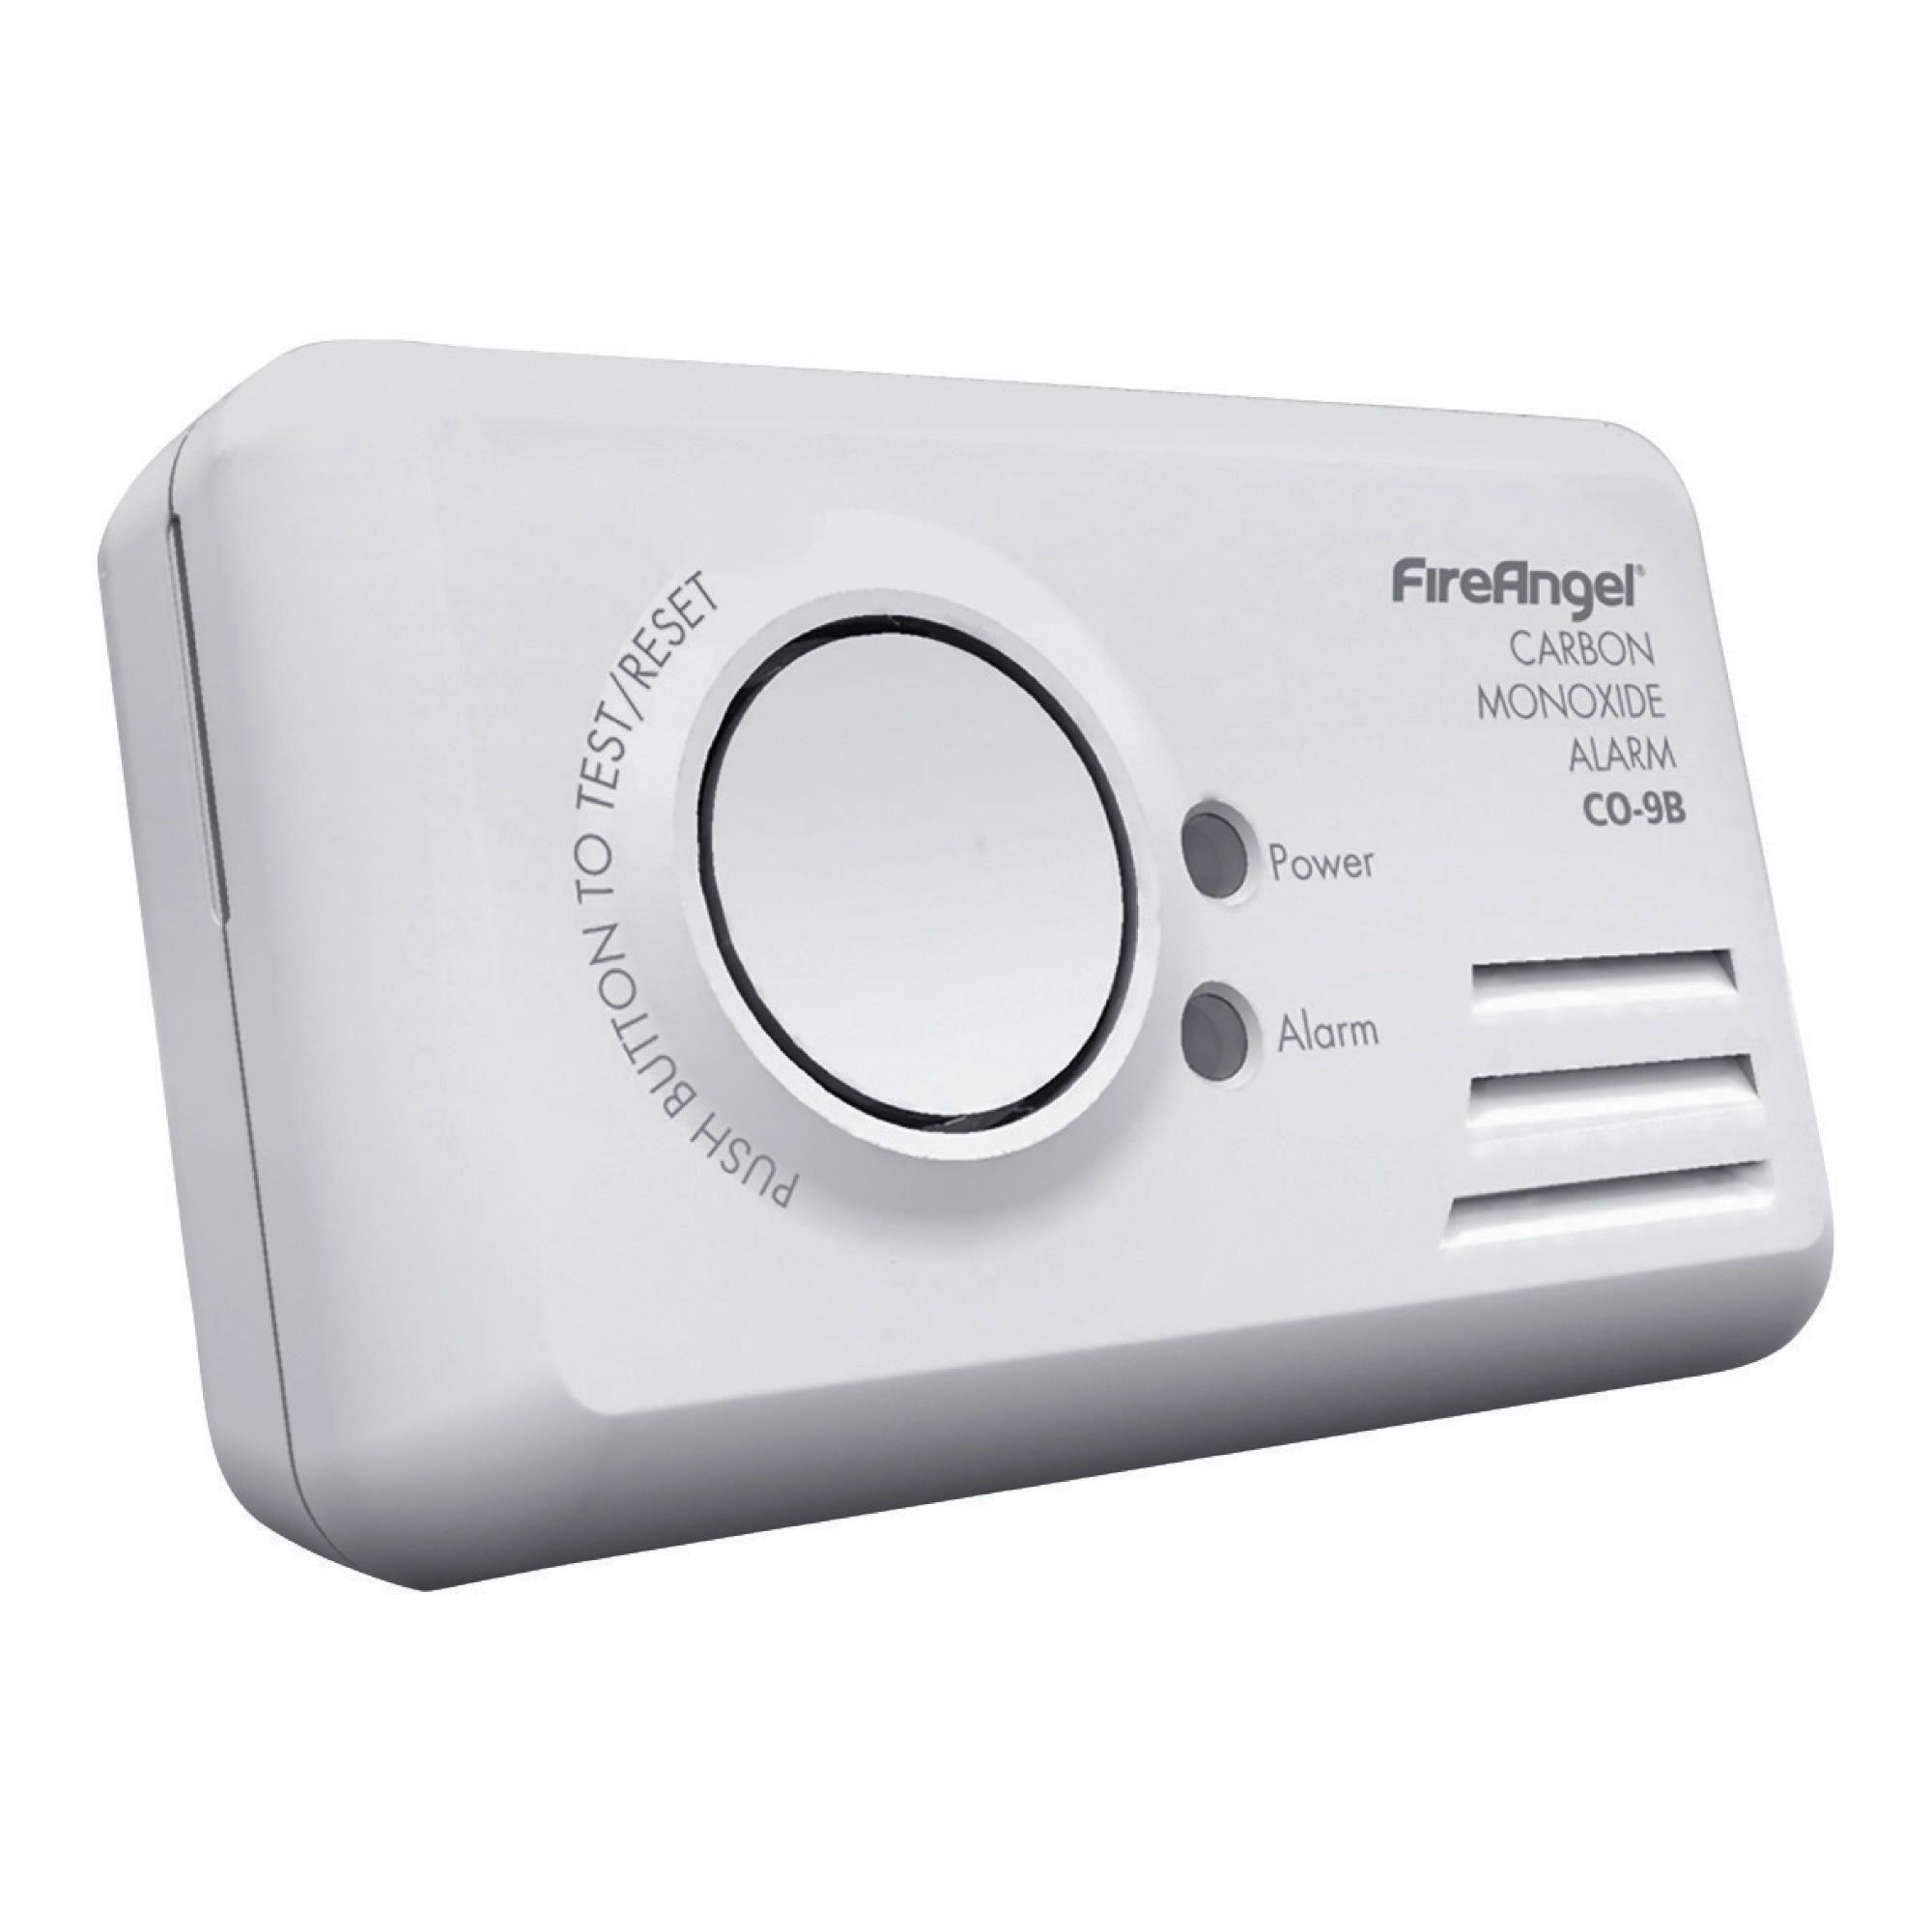 Friedland Response Single Room Pir Alarm With Remote Control